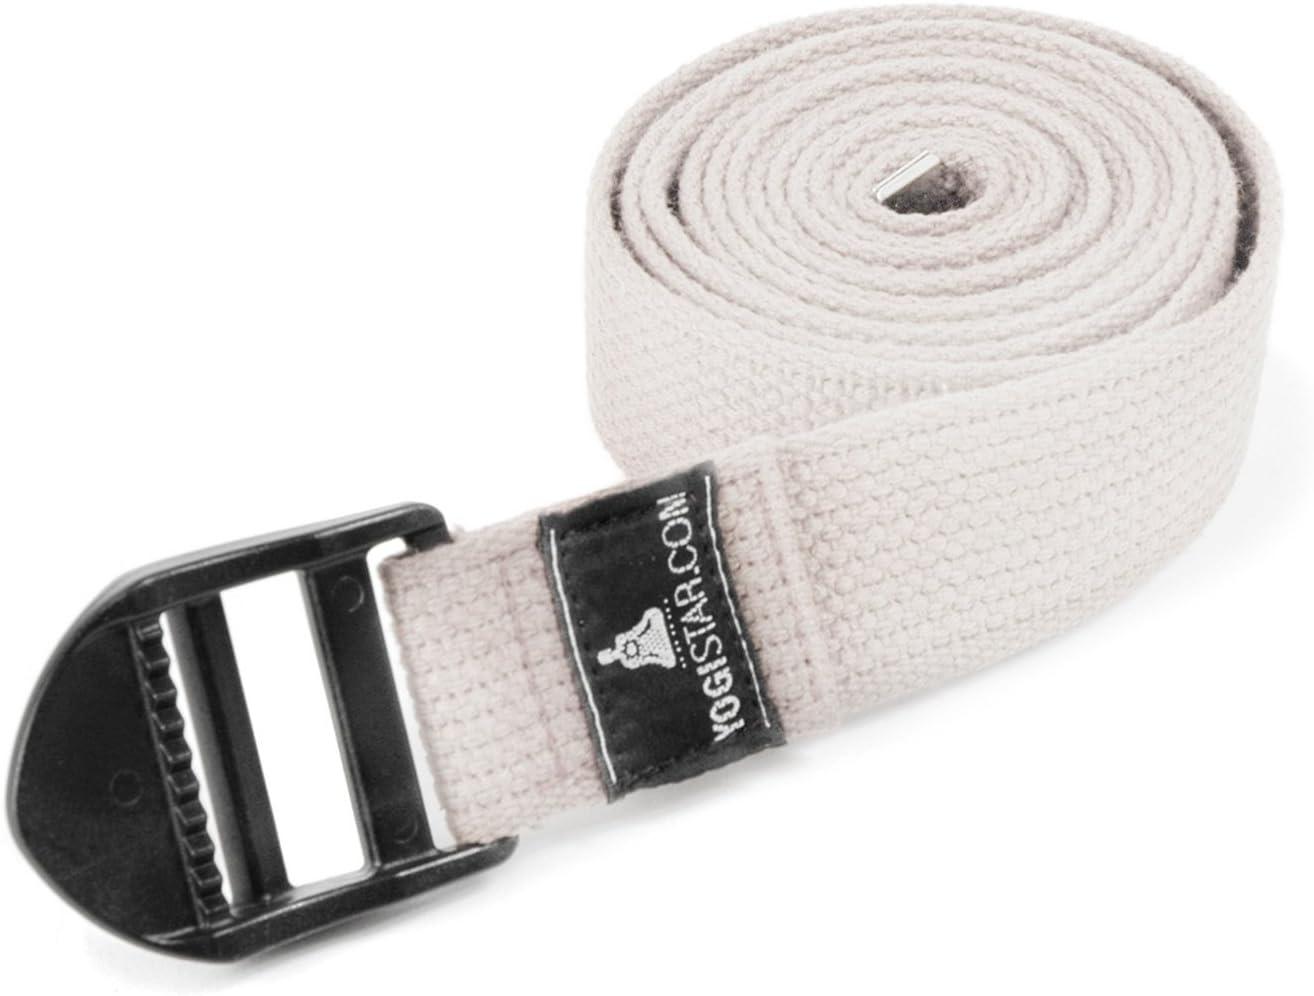 Yogistar-Cintura da Yoga chiusura in plastica